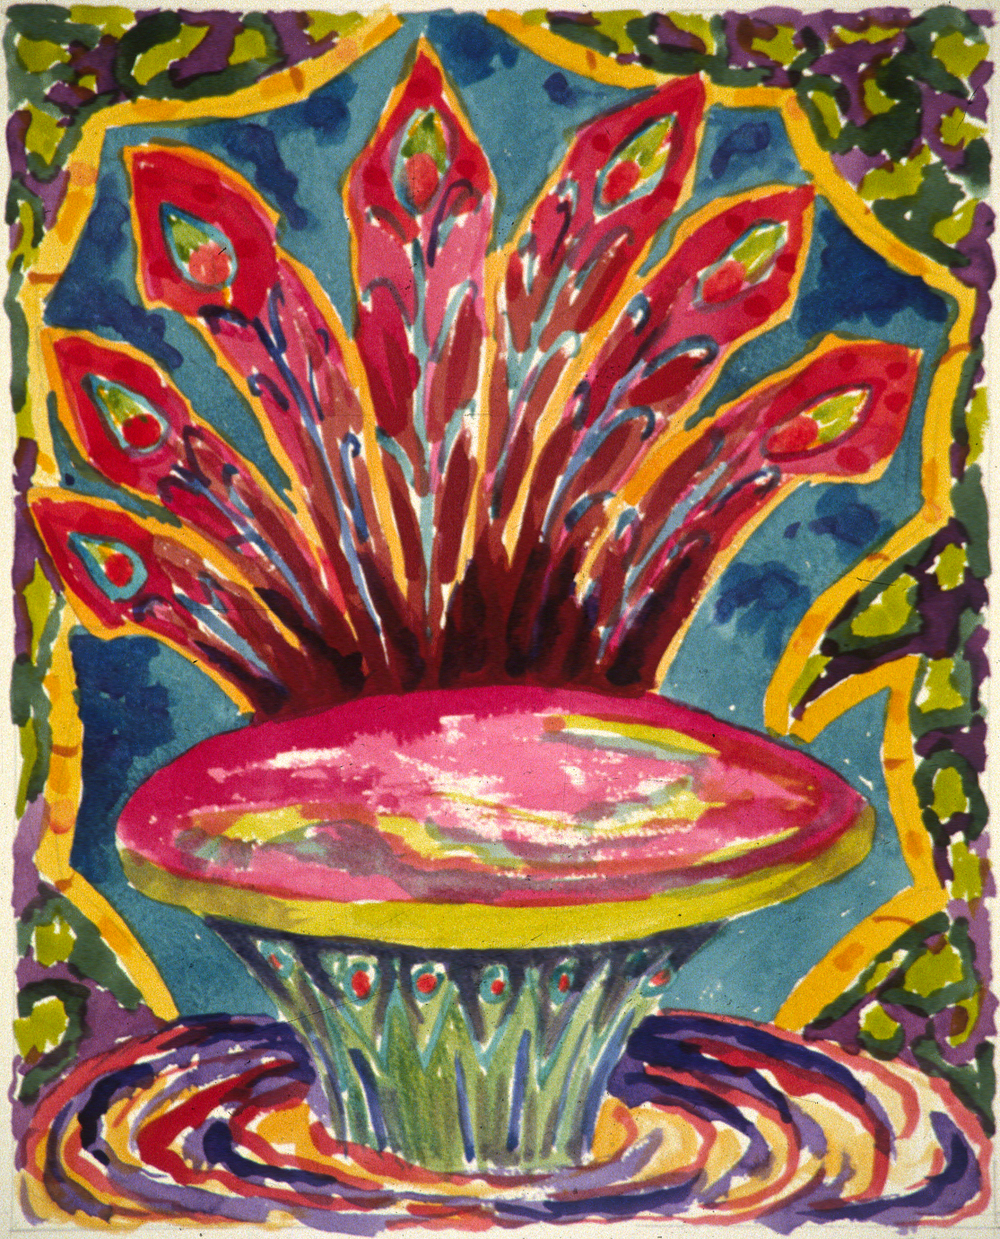 "Untitled, 30x22"", 1989"